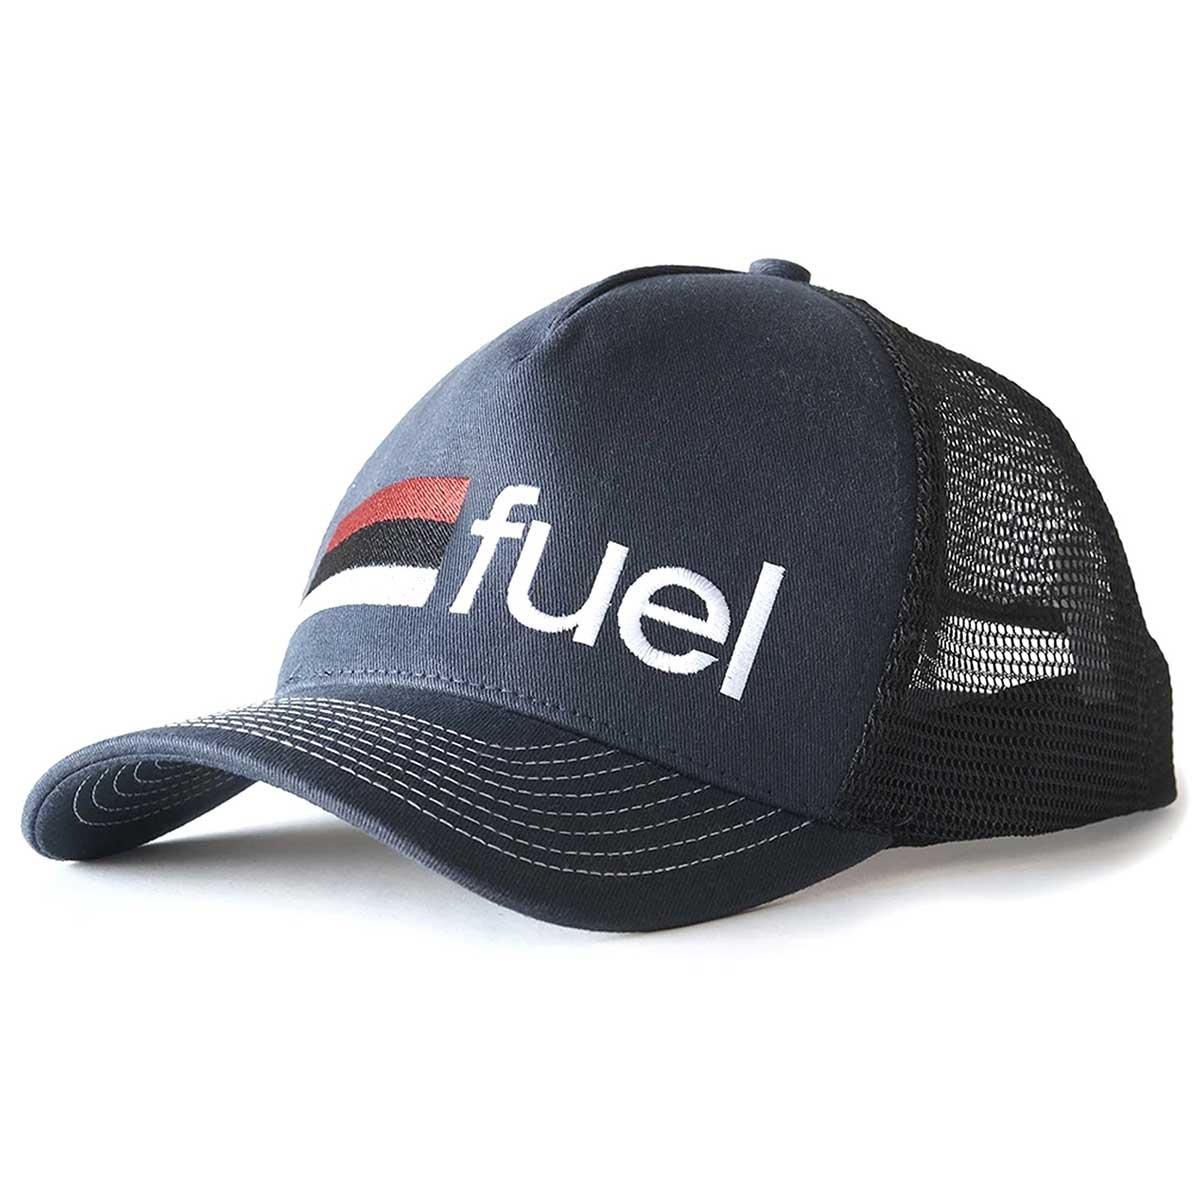 Fuel Rally Raid Petrol Cap